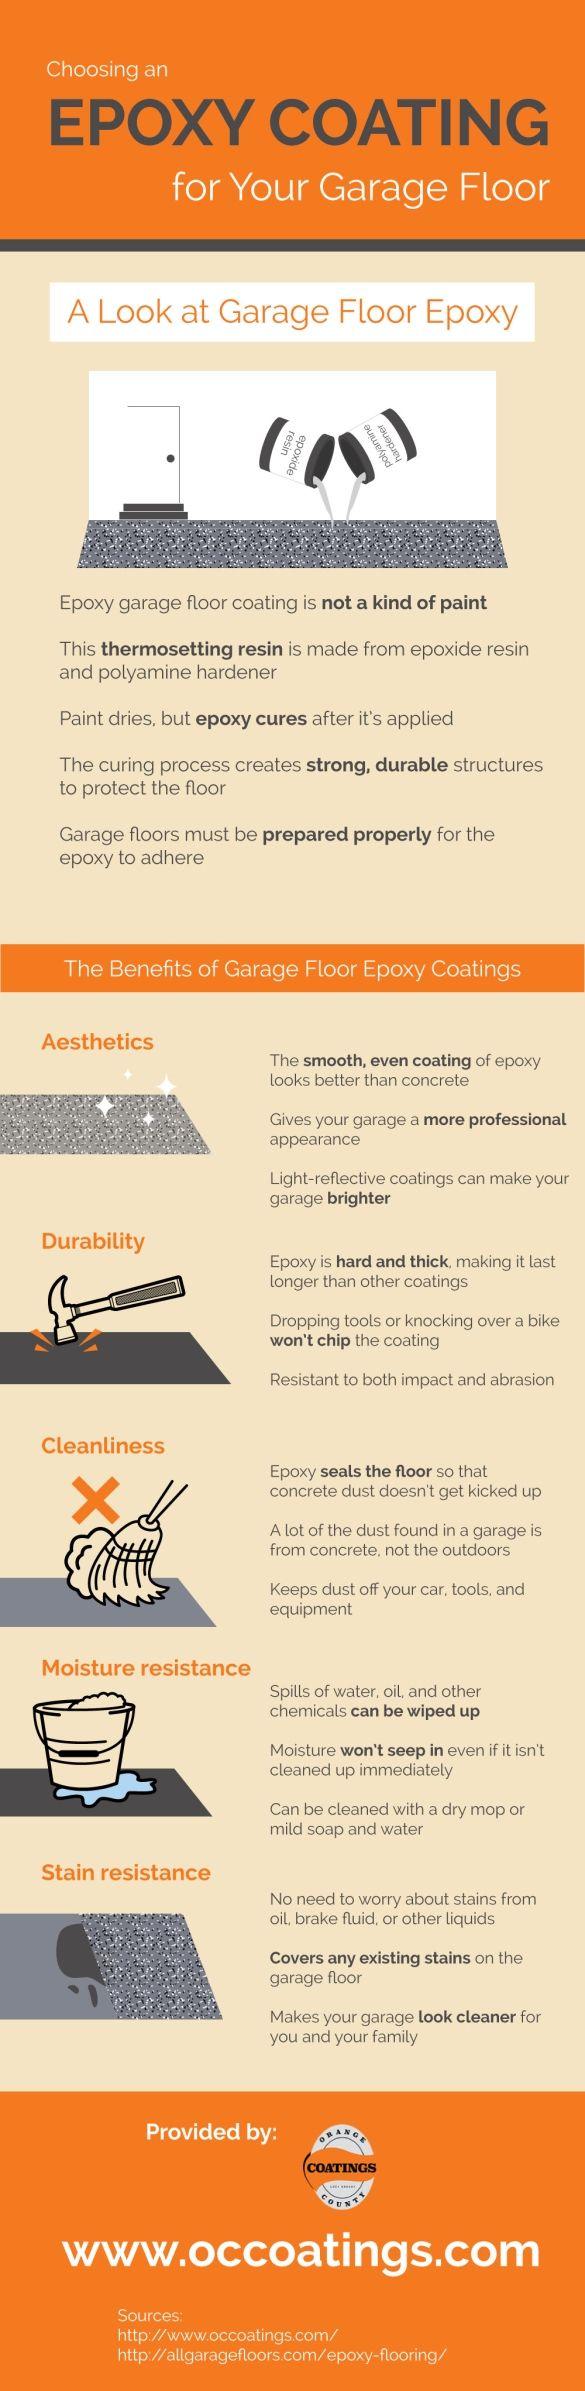 Best 25 Garage Floor Epoxy Ideas On Pinterest Painted